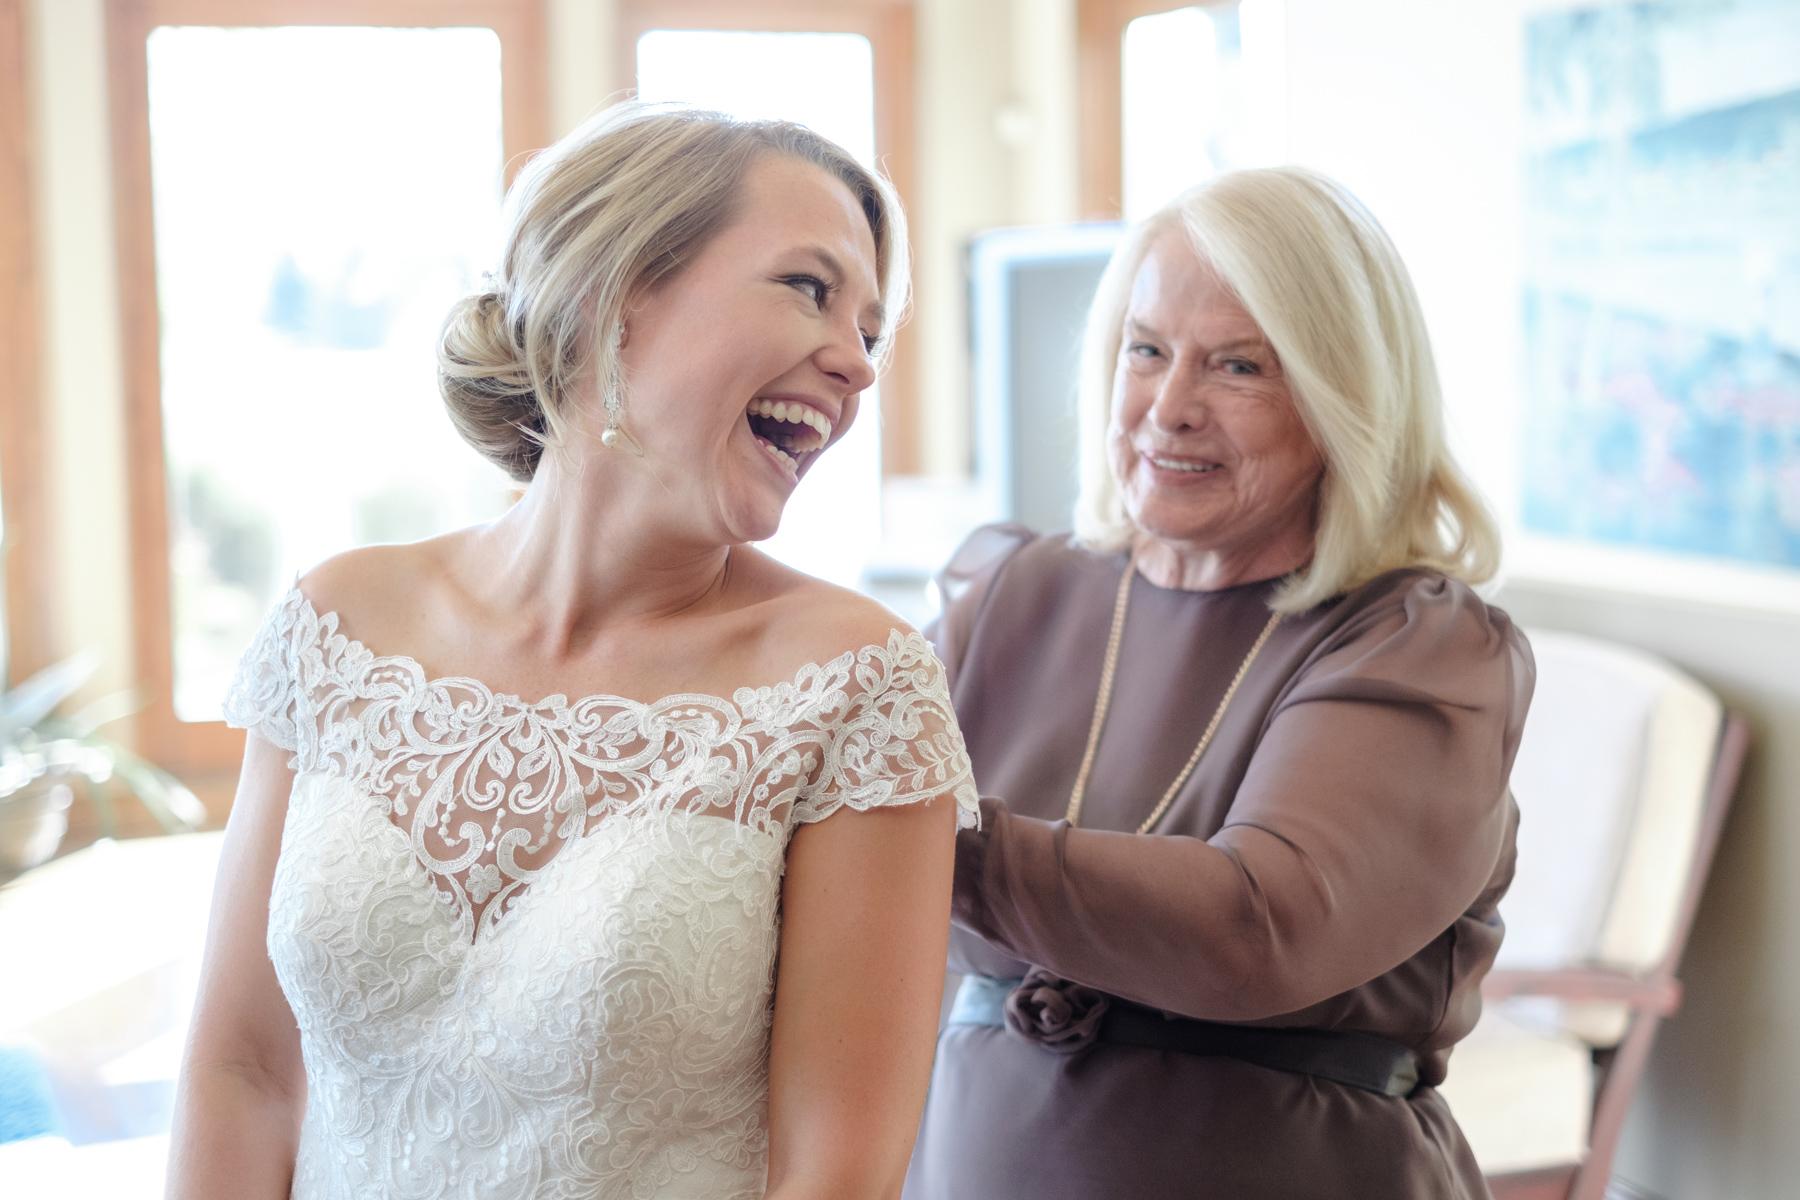 2017_BAP_KalliMatt_Gleneagles_CountryClub_Lemont_Wedding-17.jpg